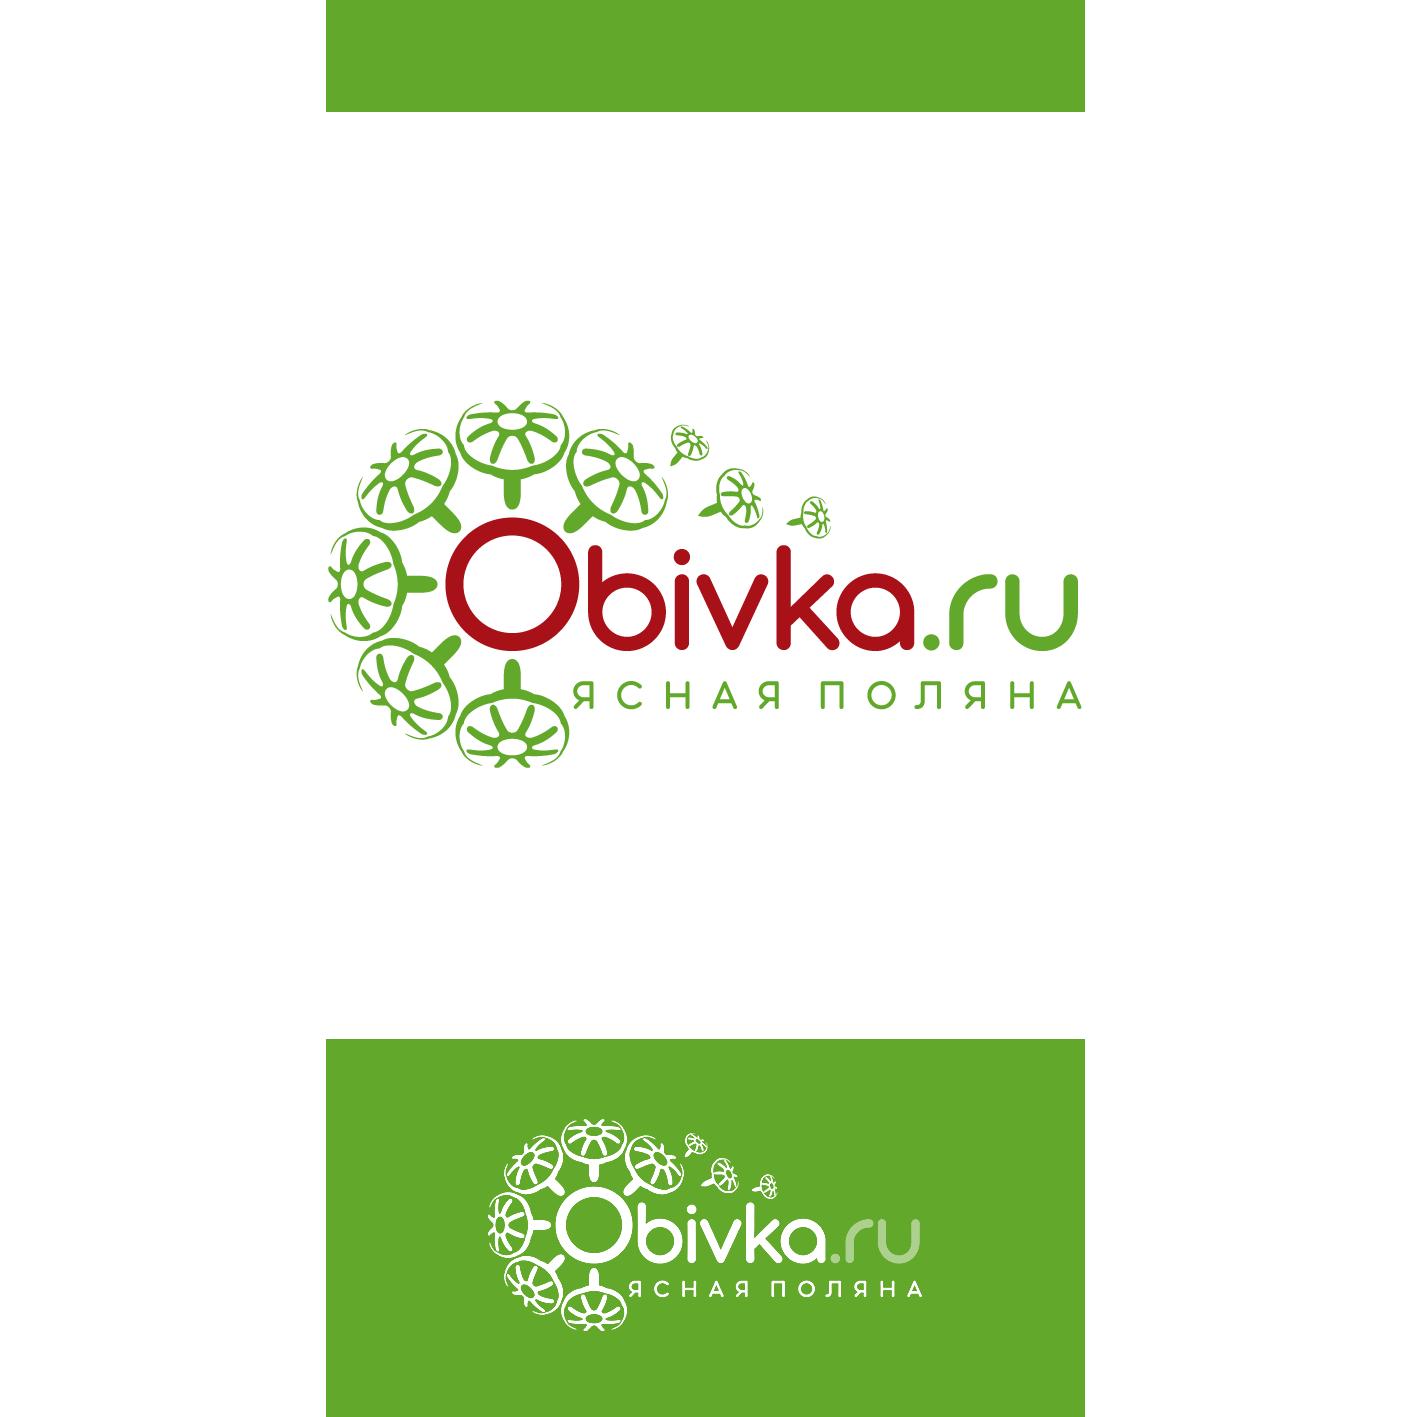 Логотип для сайта OBIVKA.RU фото f_0975c1b353c8d463.png